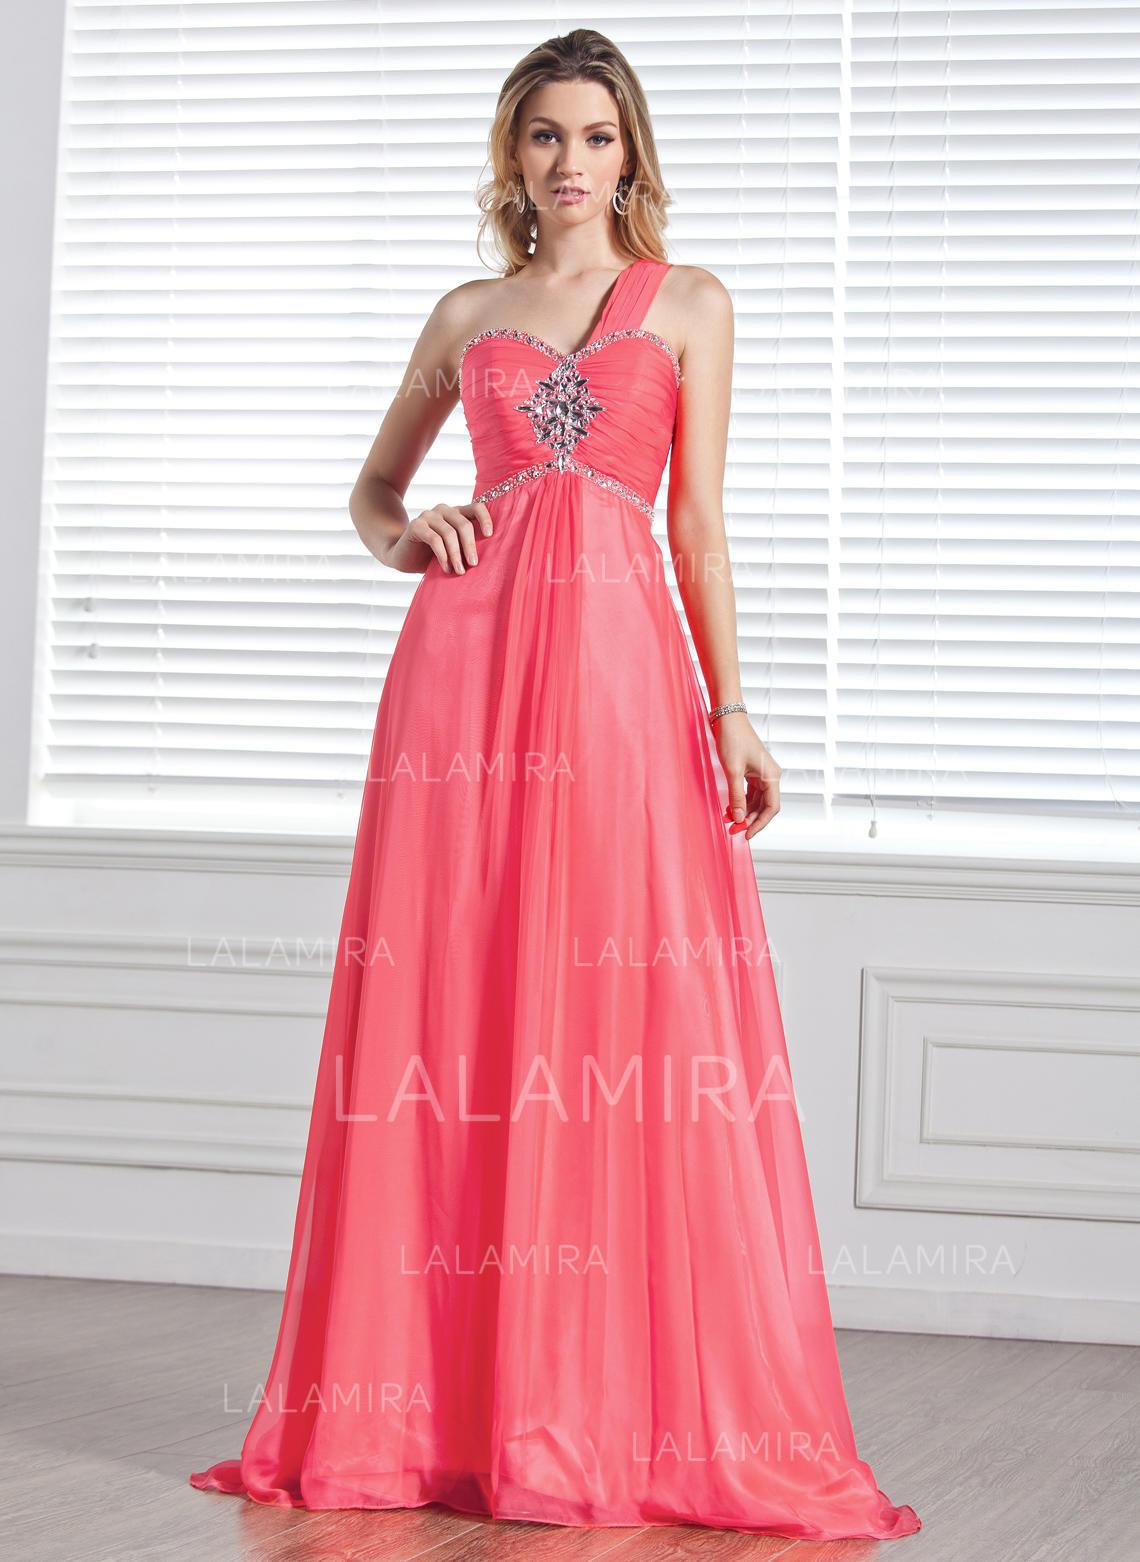 a-line/princess sleeveless ruffle beading chiffon prom dresses